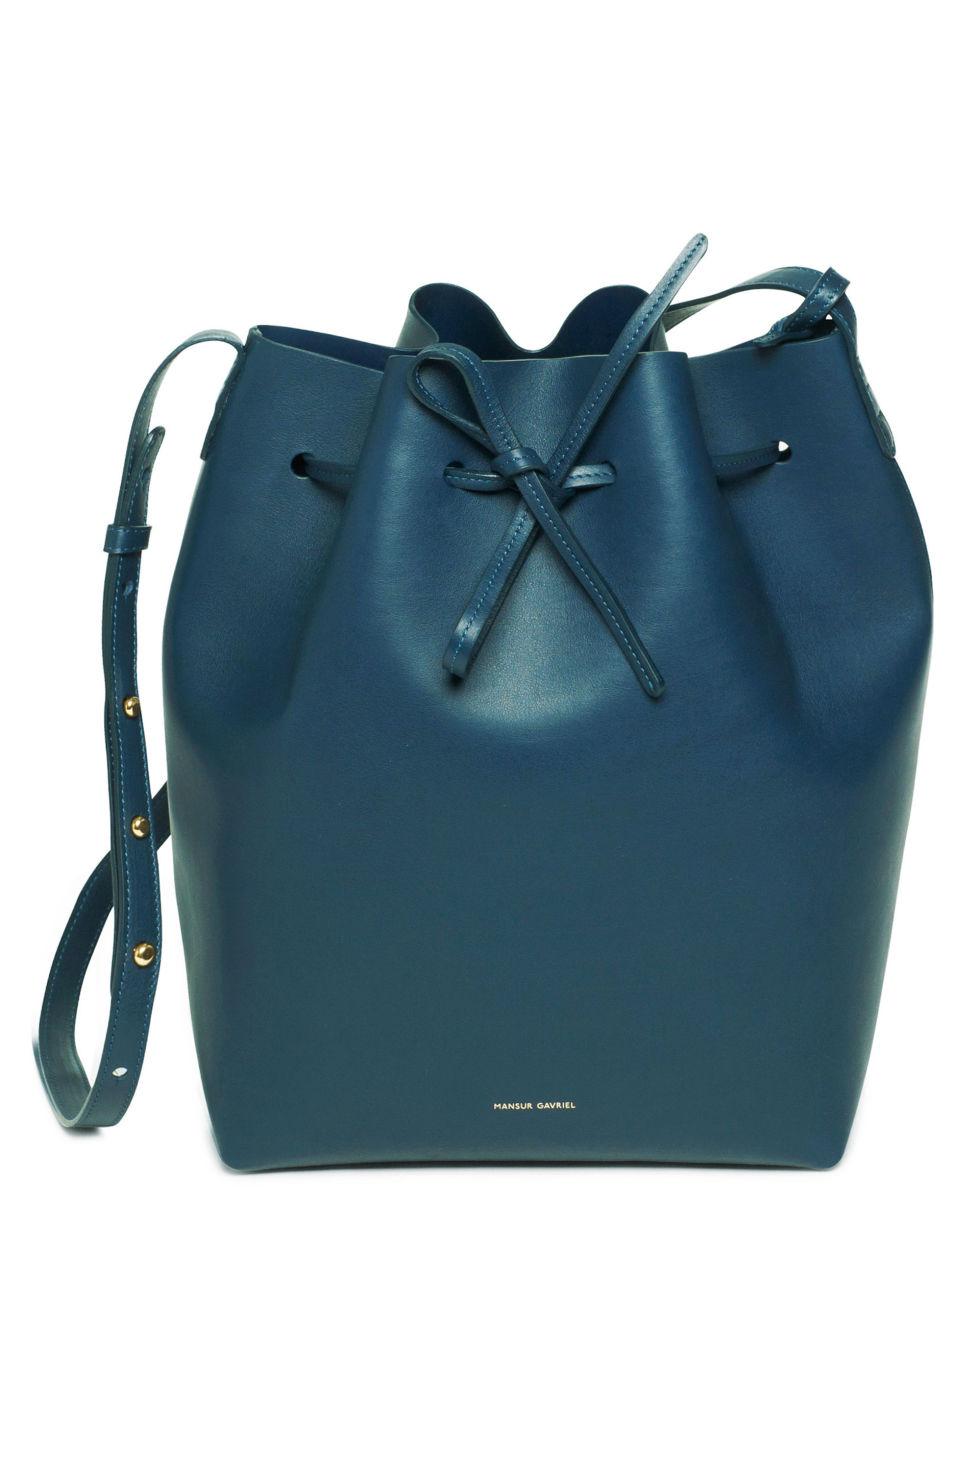 The best mid-range designer handbags – Best affordable designer bags